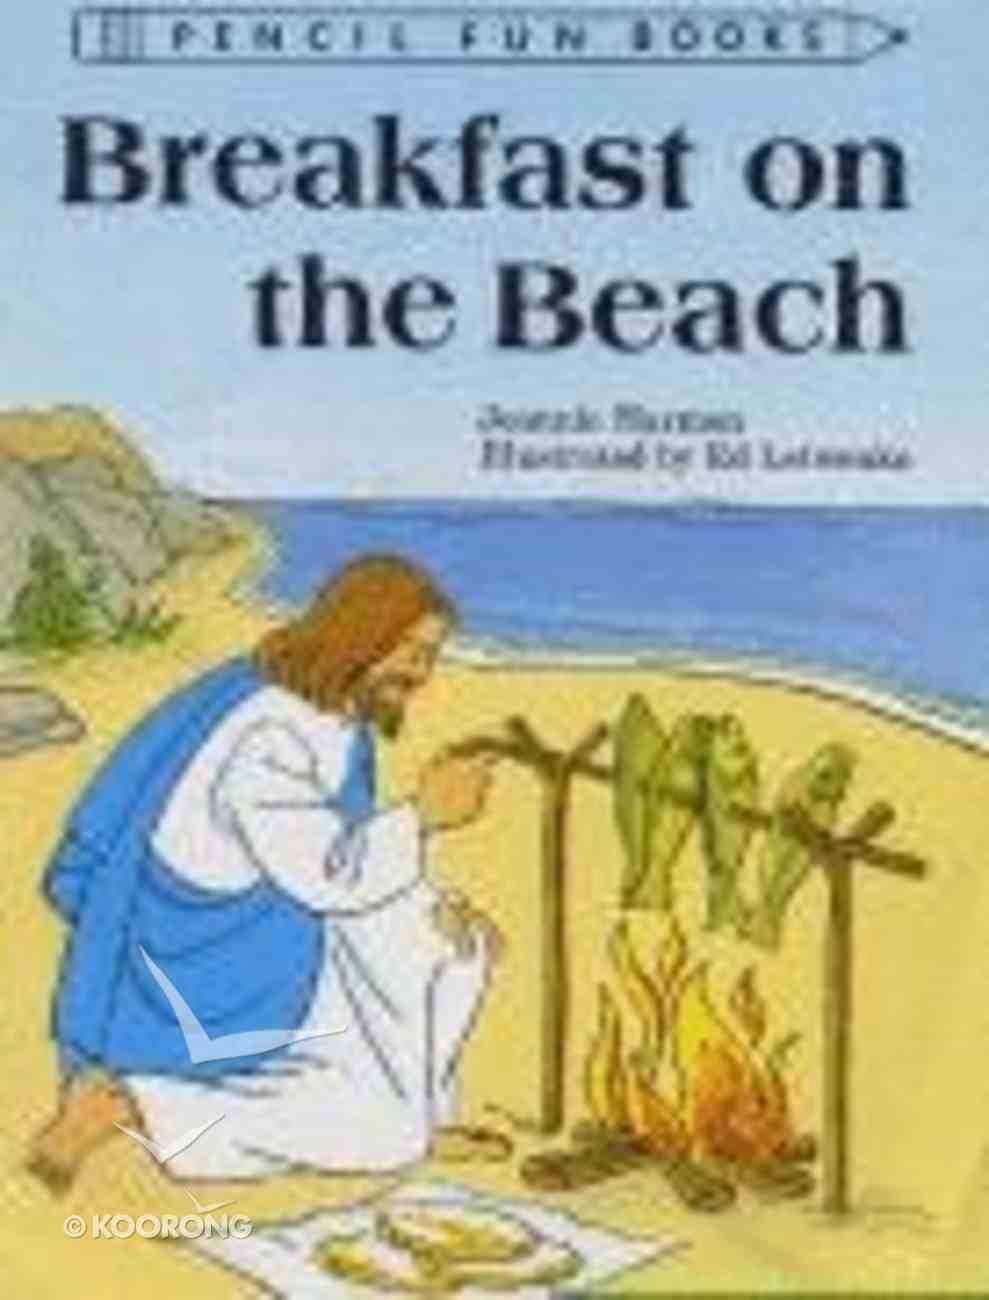 Breakfast on the Beach (Pencil Fun Books Series) Paperback